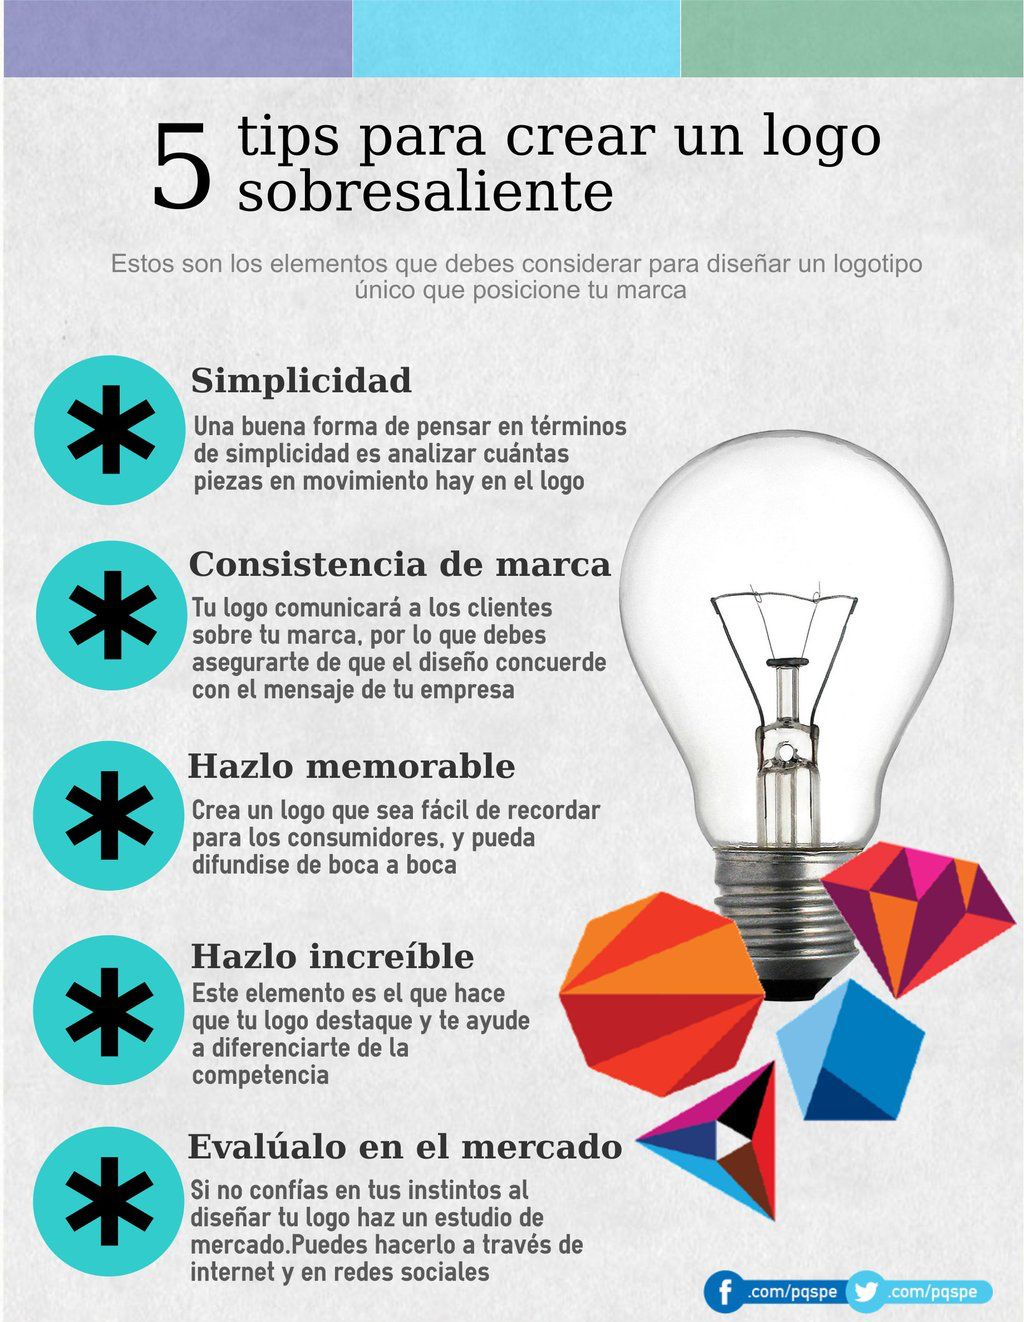 Pin By Beatriz Vasco On Business Instagram Tips Seo Marketing Search Engine Marketing Sem